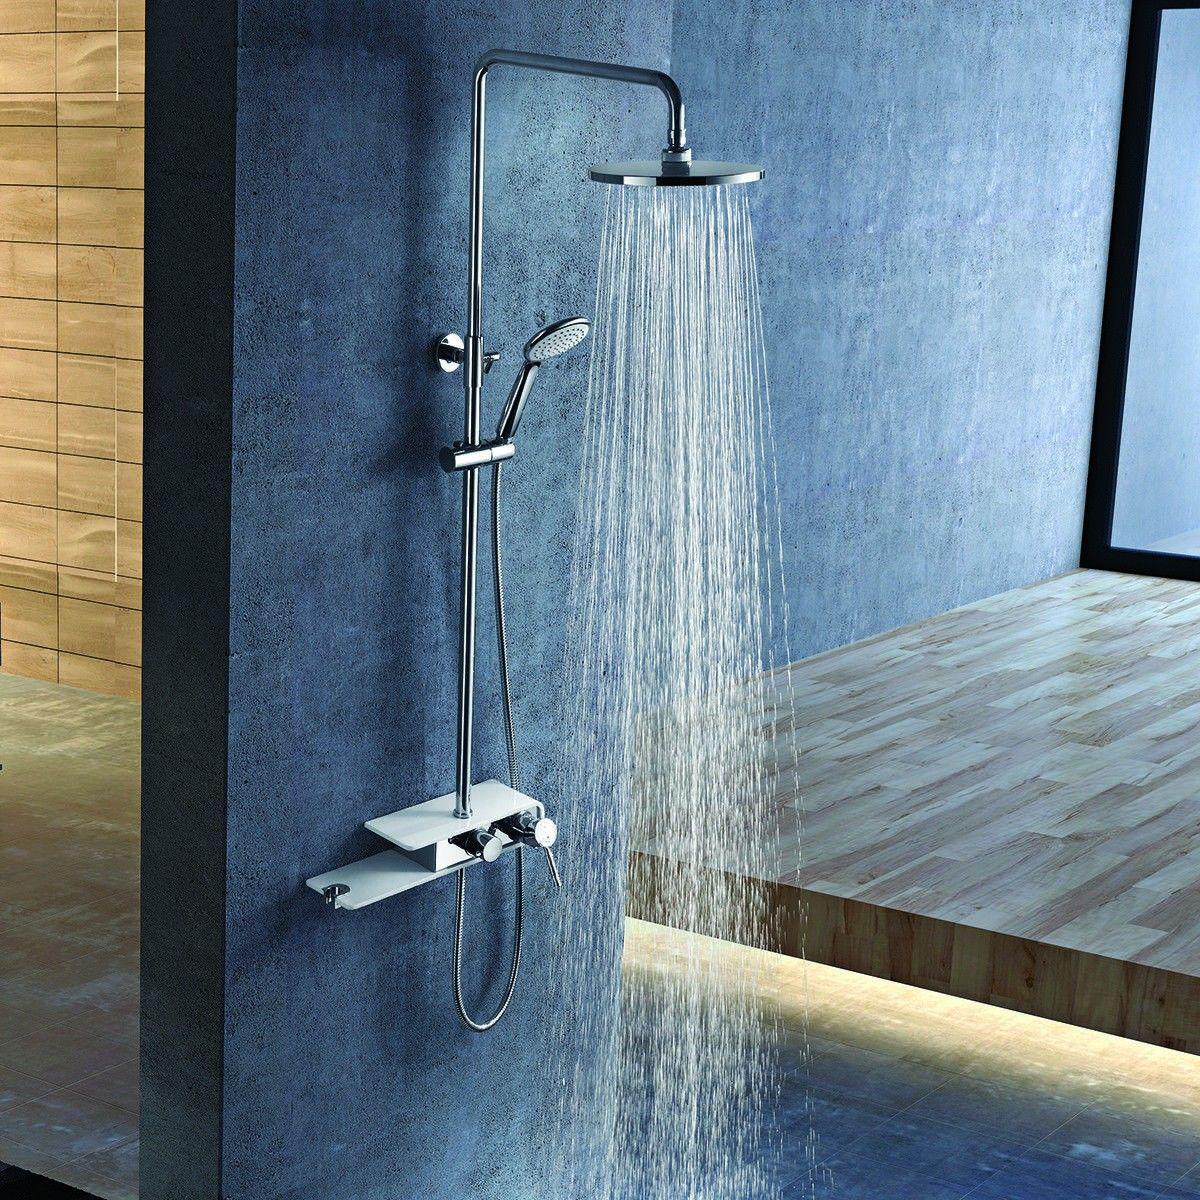 Stainless Steel Panel Rainfall Shower Column w /Hand Shower ...